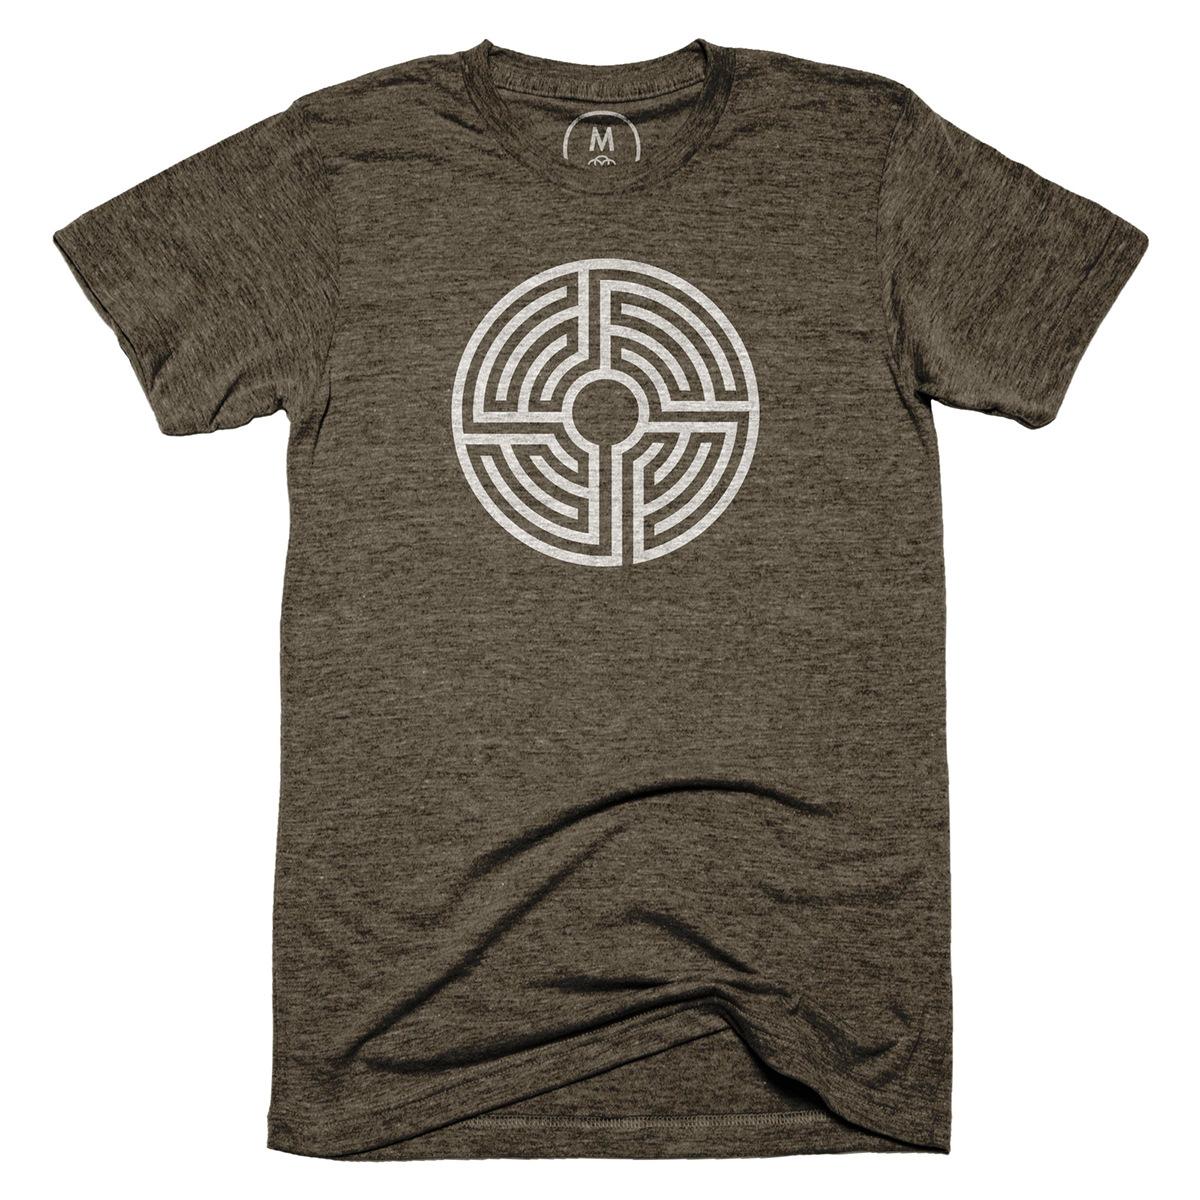 tee shirt,t-shirt,labyrinth,cotton bureau